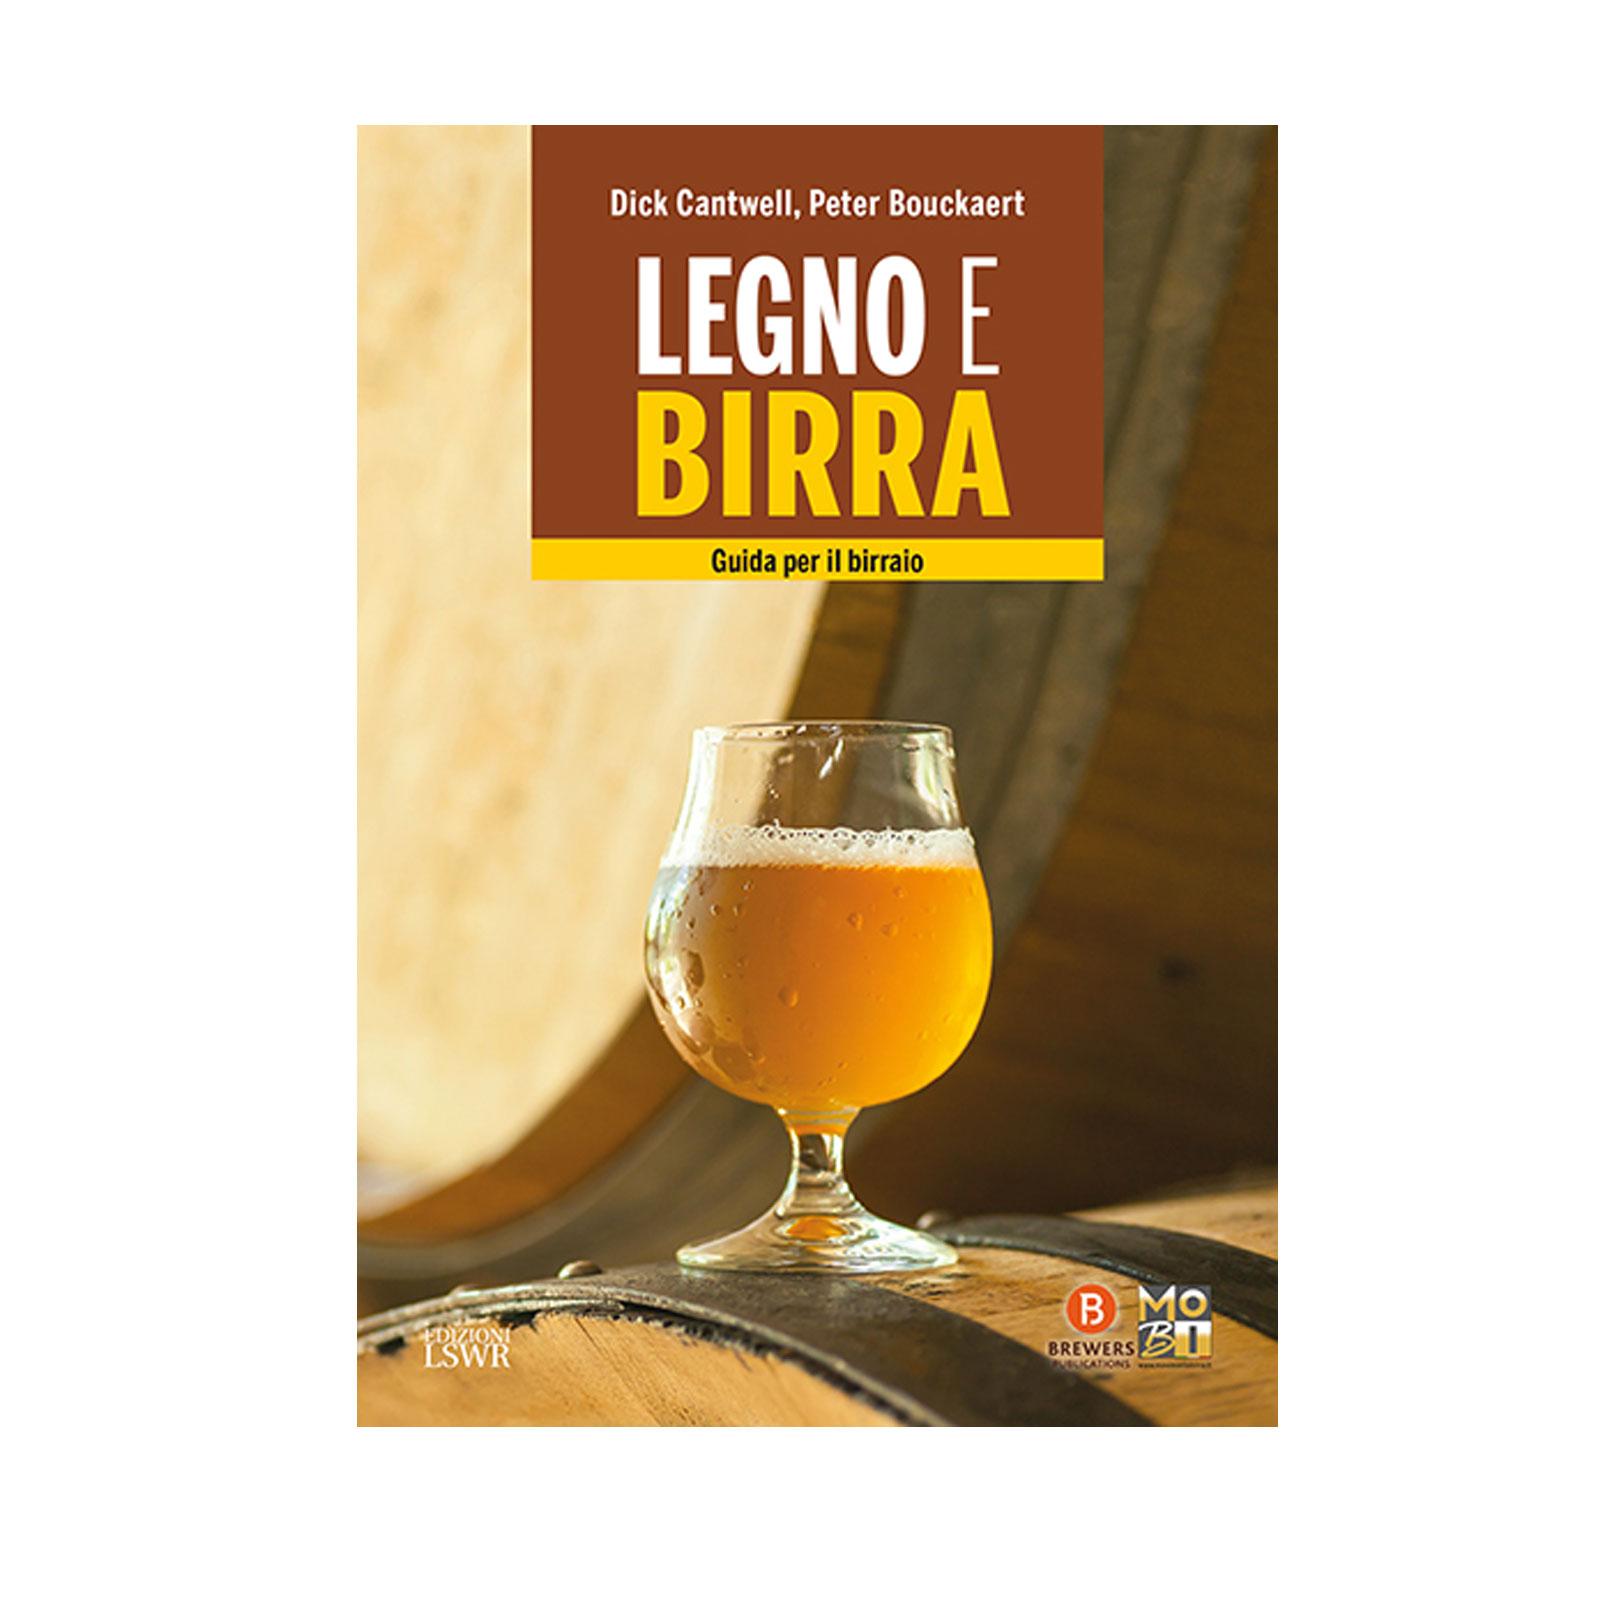 Libro Legno e Birra di Dick Cantwell, Peter Bouckaert